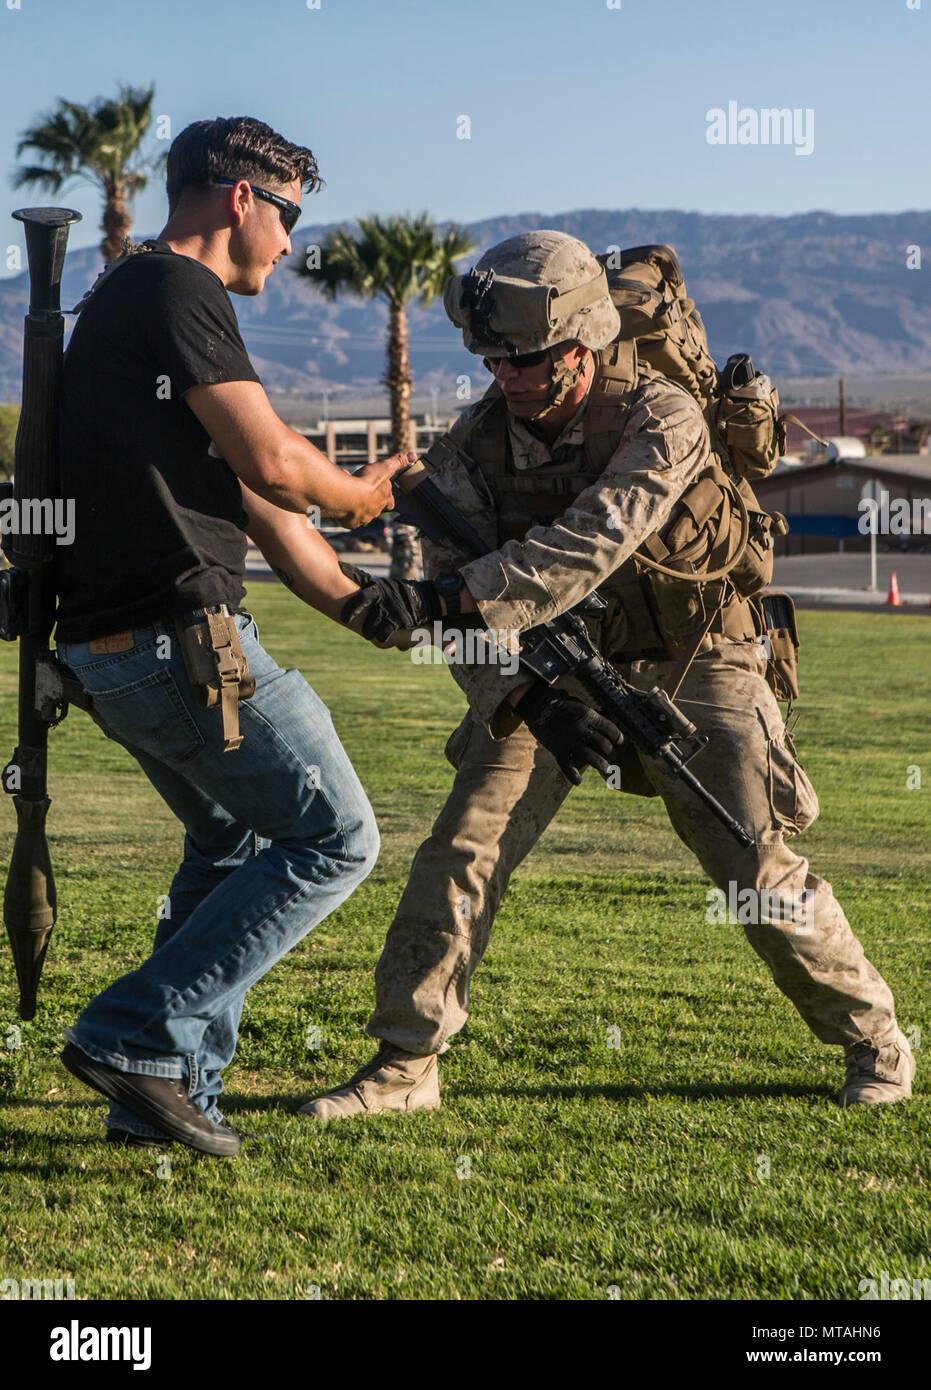 Beste Marine Corps Bilderrahmen Ideen - Benutzerdefinierte ...